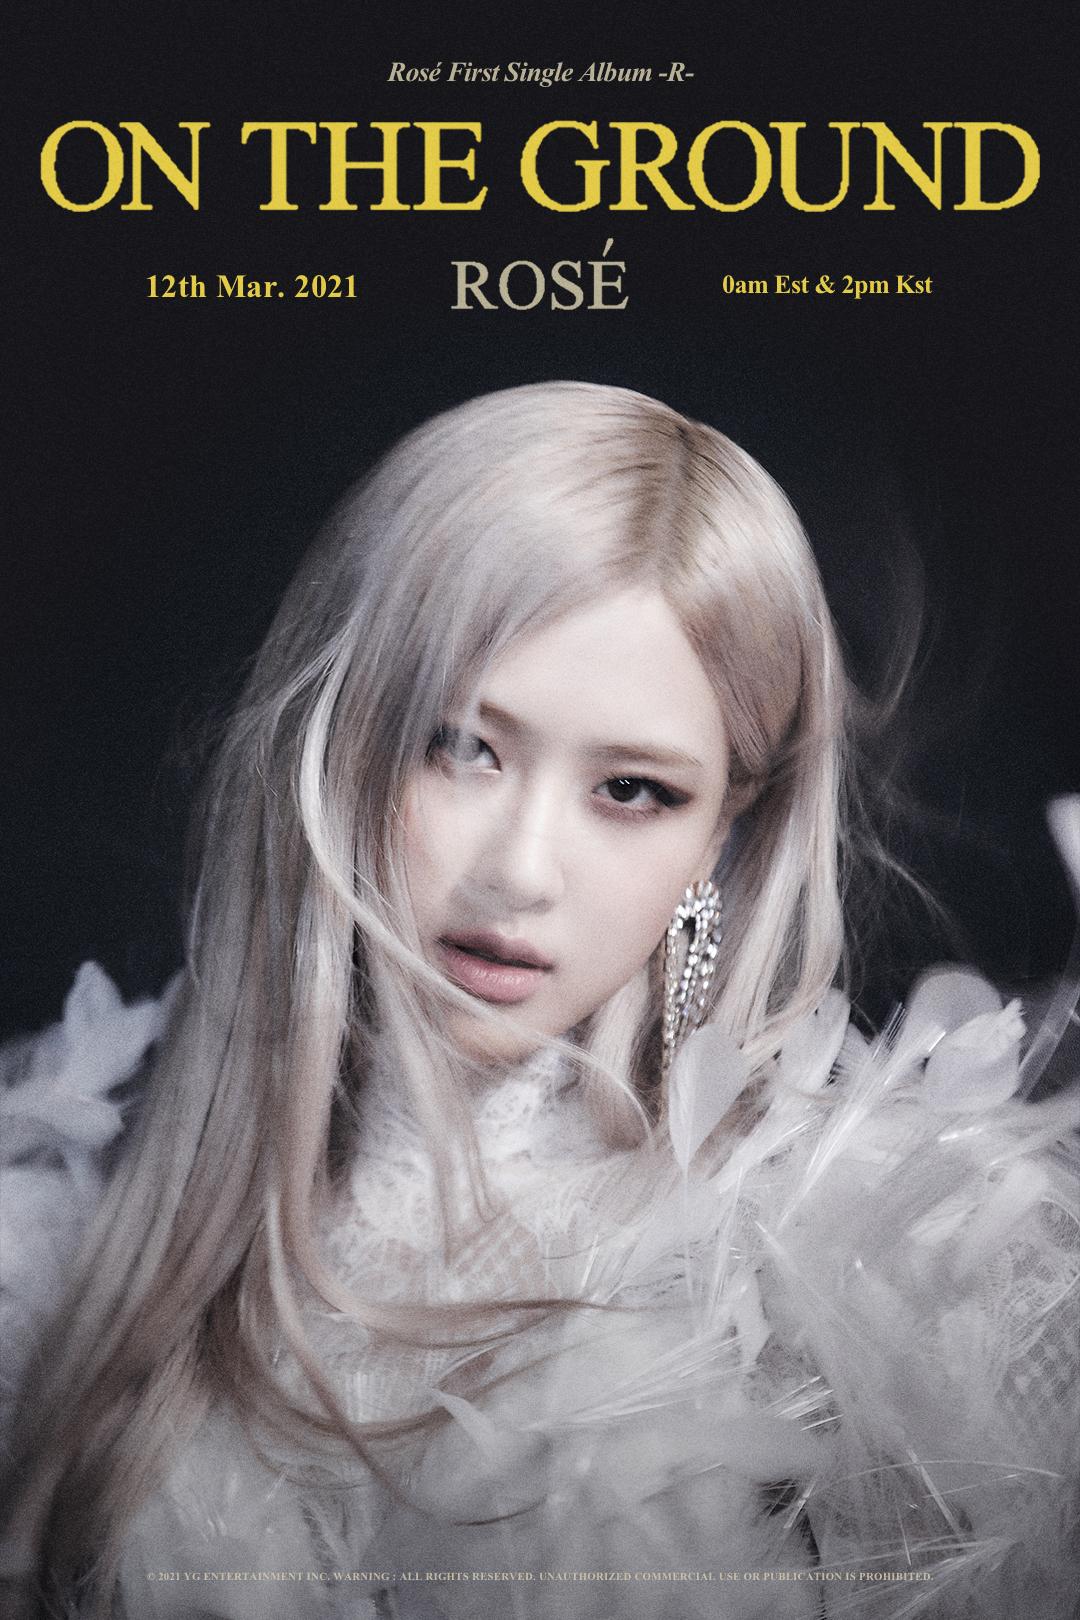 rosepreorderrecord_6